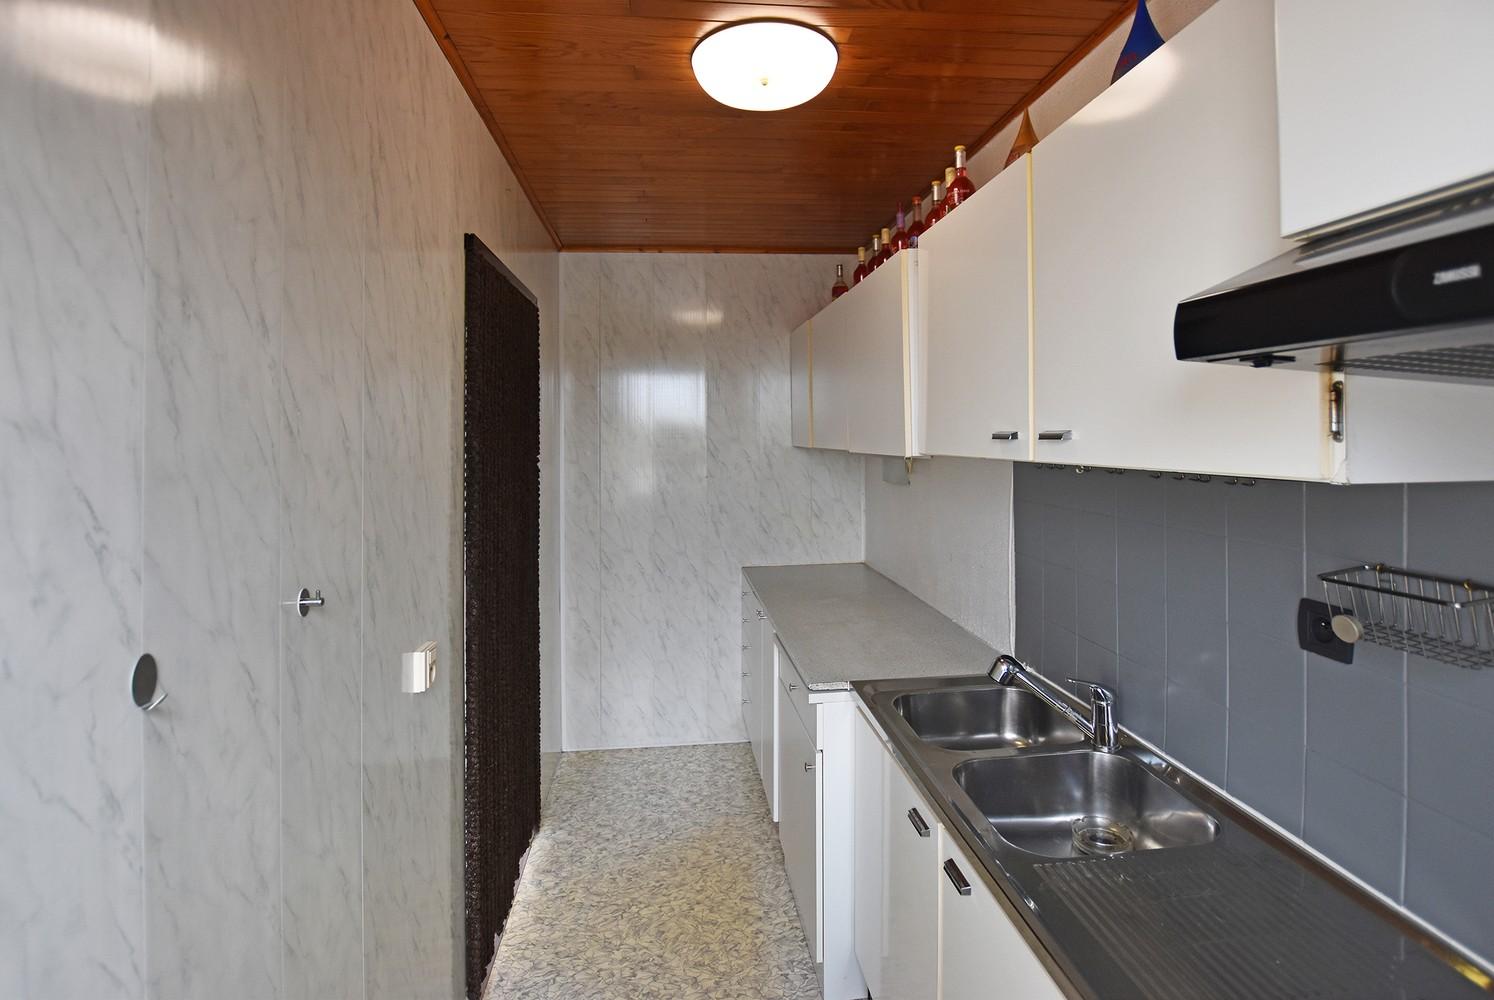 Volledig te renoveren 1-slpk appartement te Deurne afbeelding 6